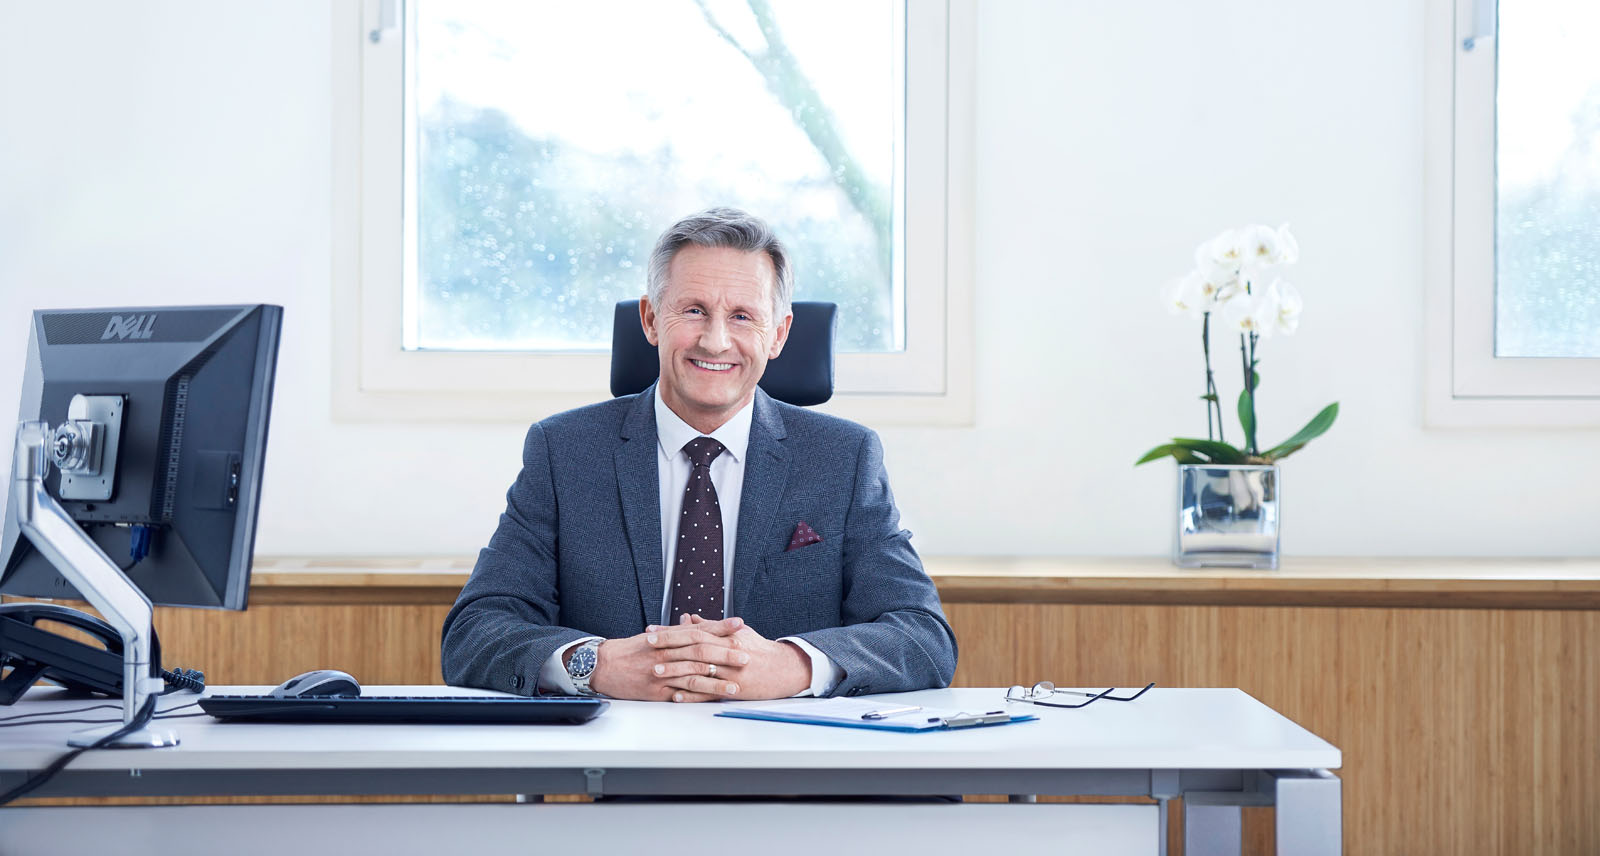 Consultant at his desk